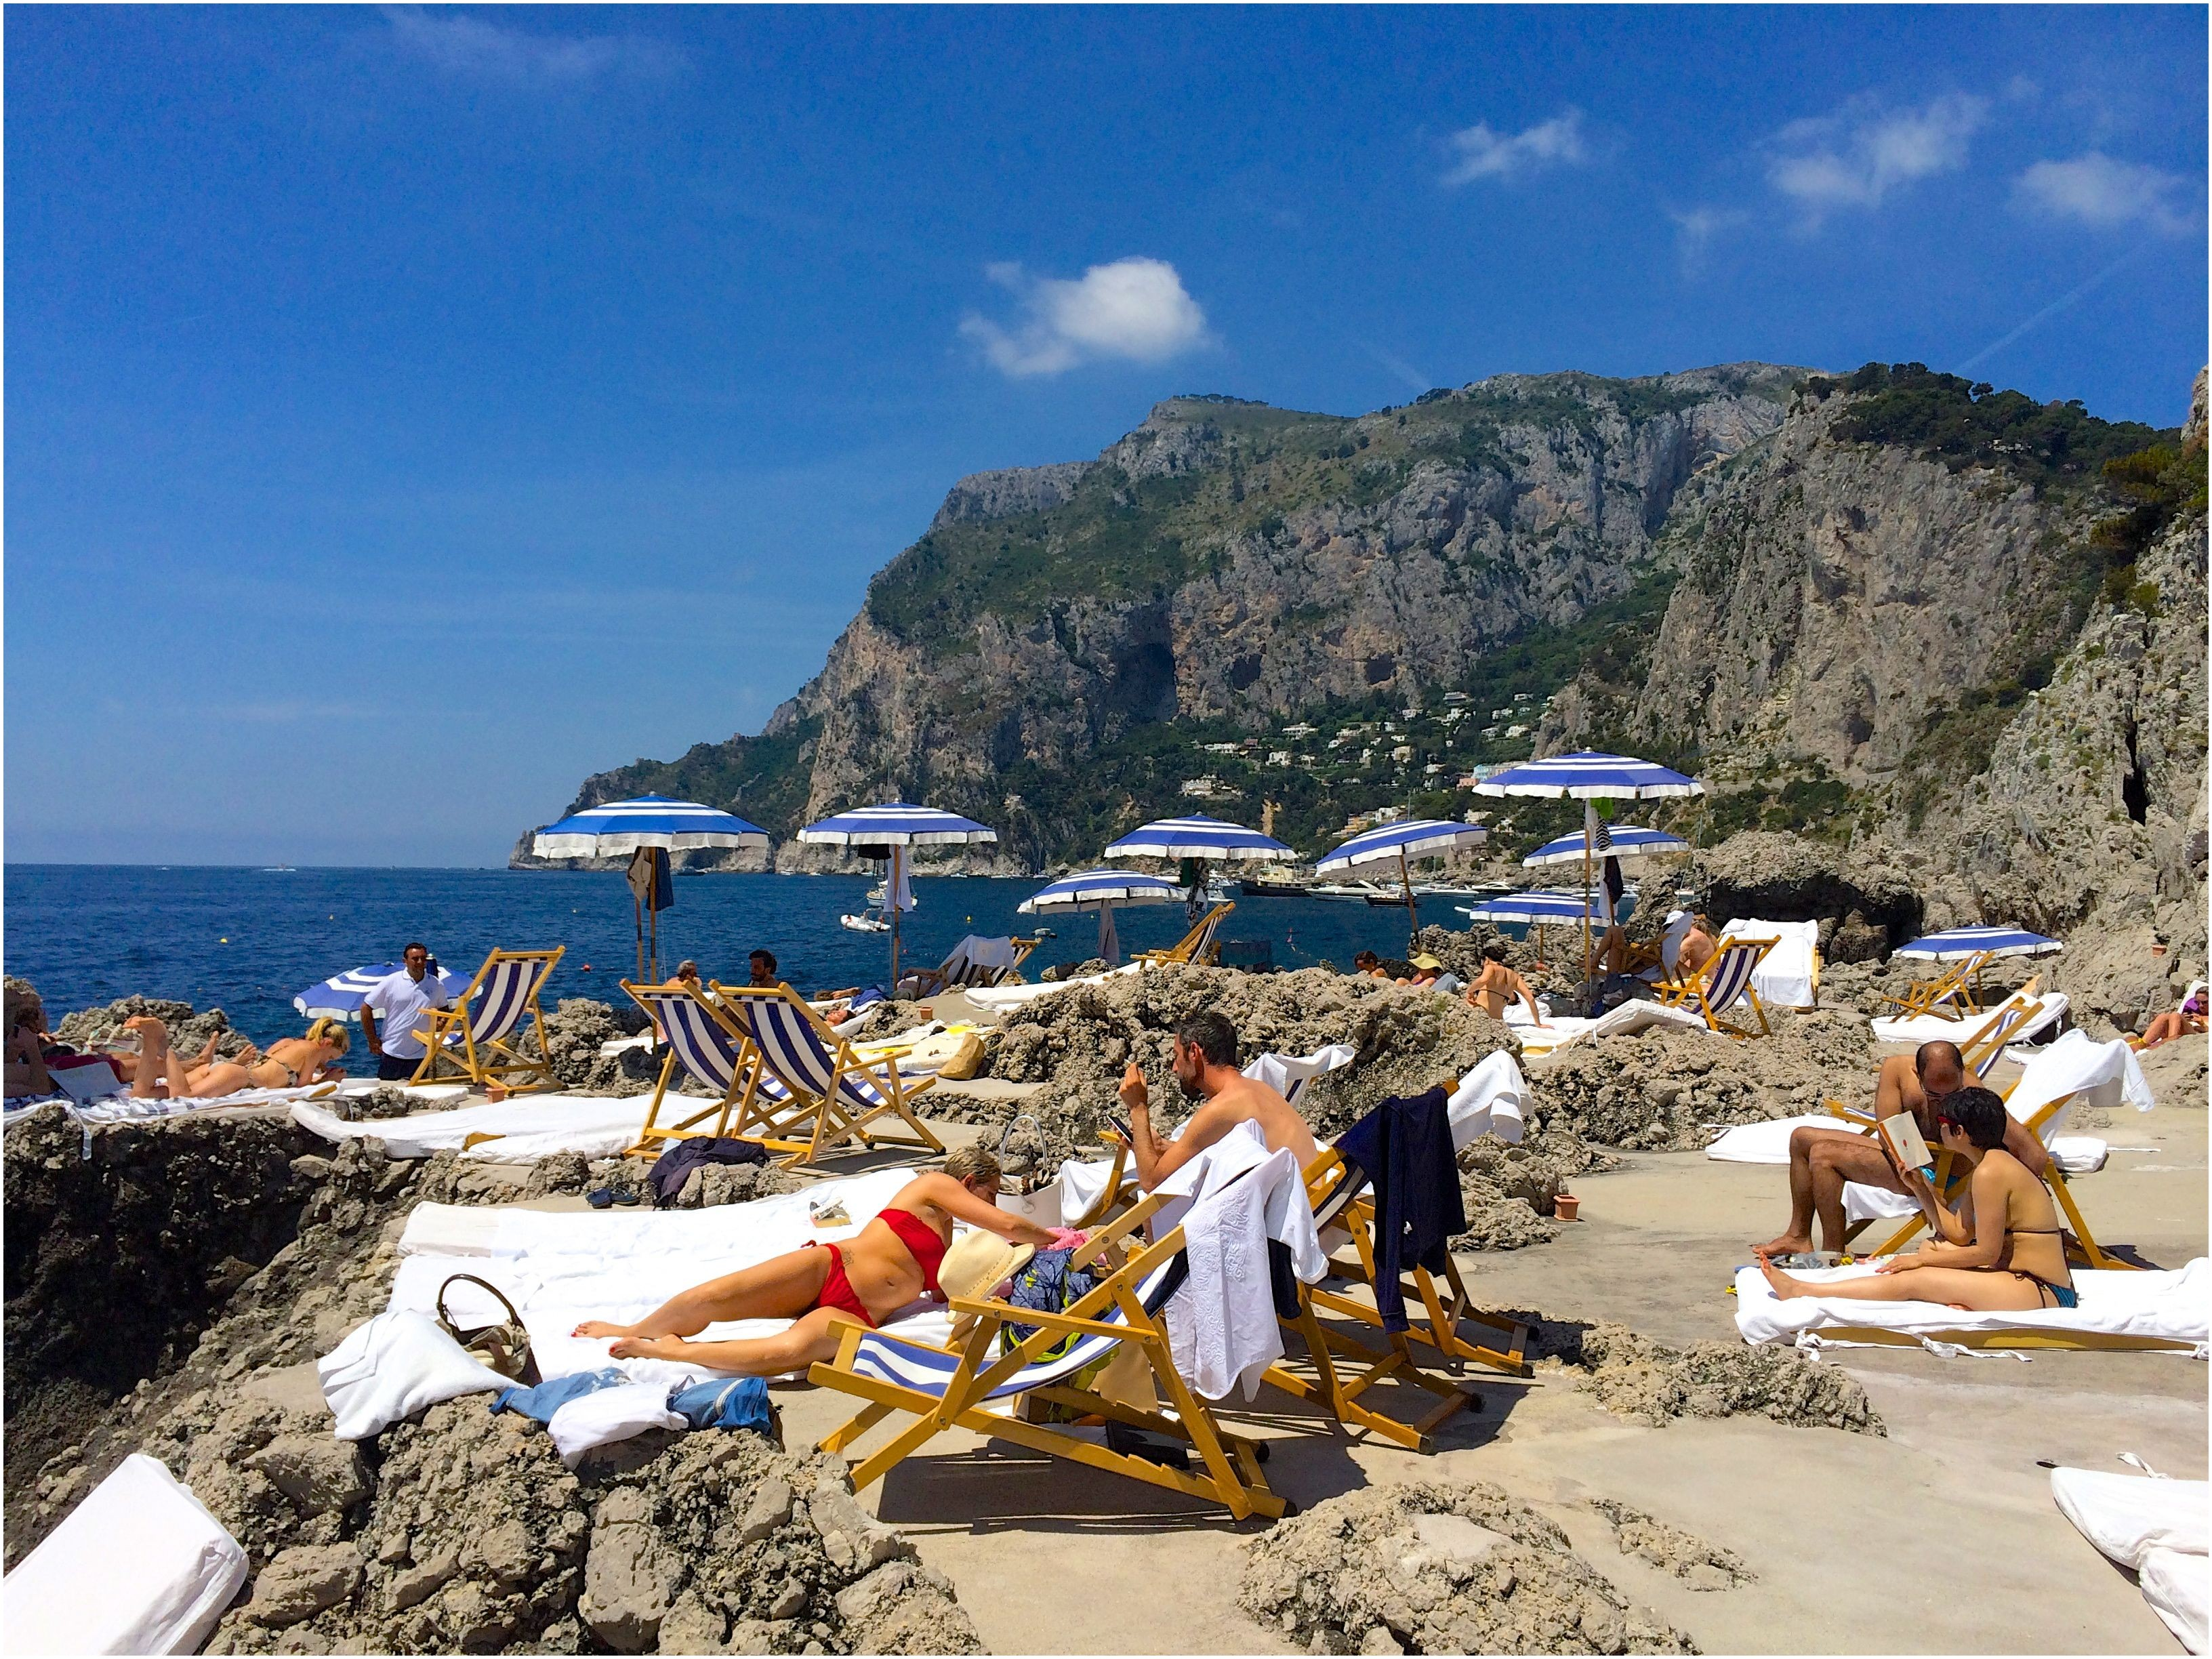 Beach Resorts In Capri Italy Fresh La Fontelina Beach Club Capri Italy